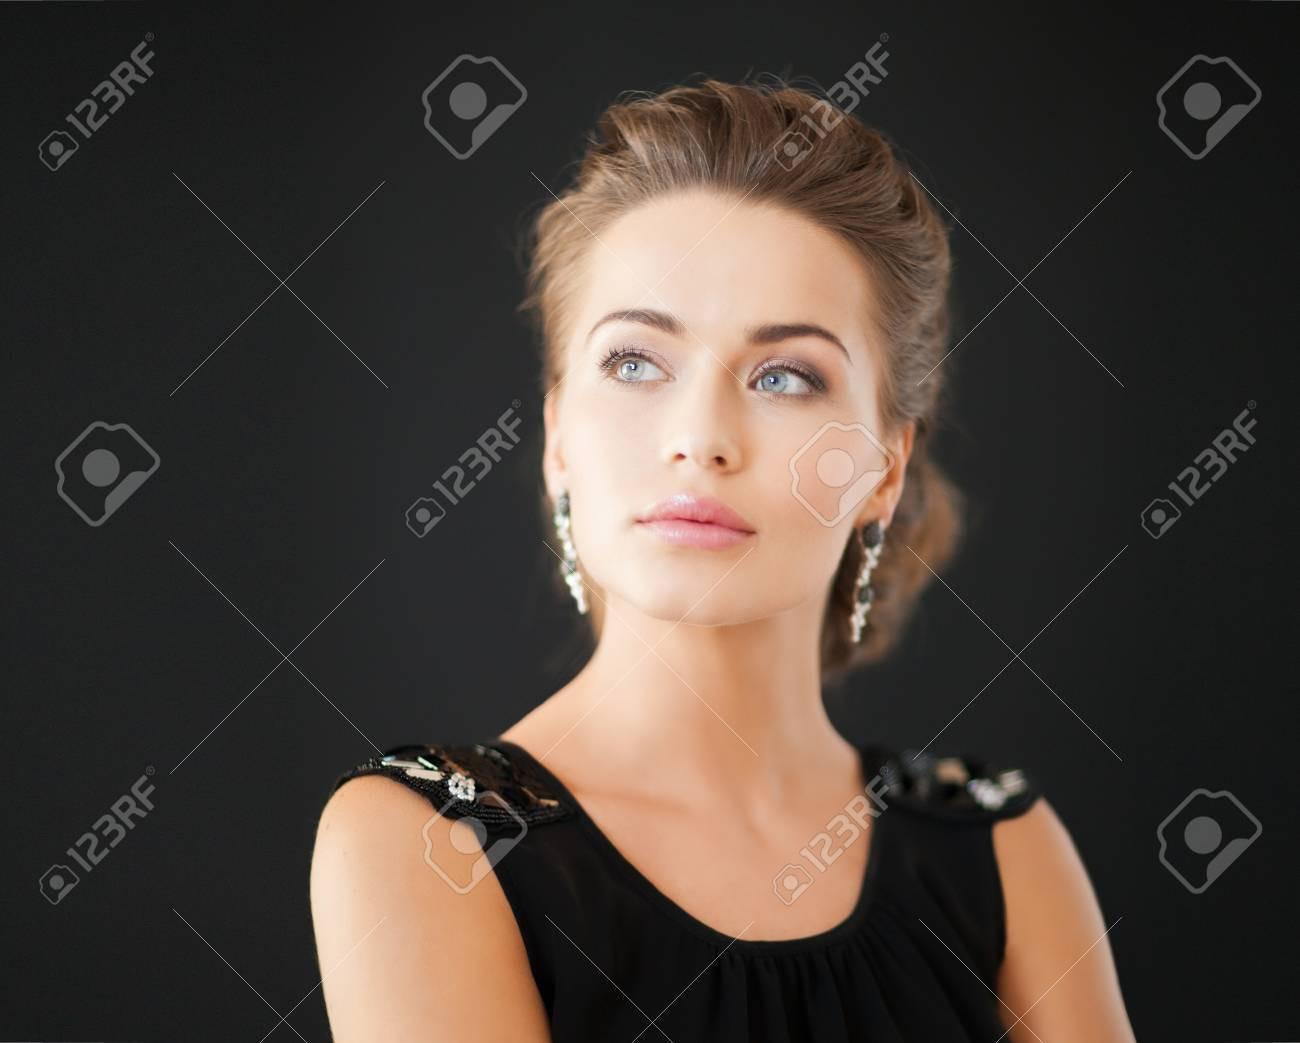 13 Schön Ohrringe Abendkleid ÄrmelFormal Perfekt Ohrringe Abendkleid Vertrieb